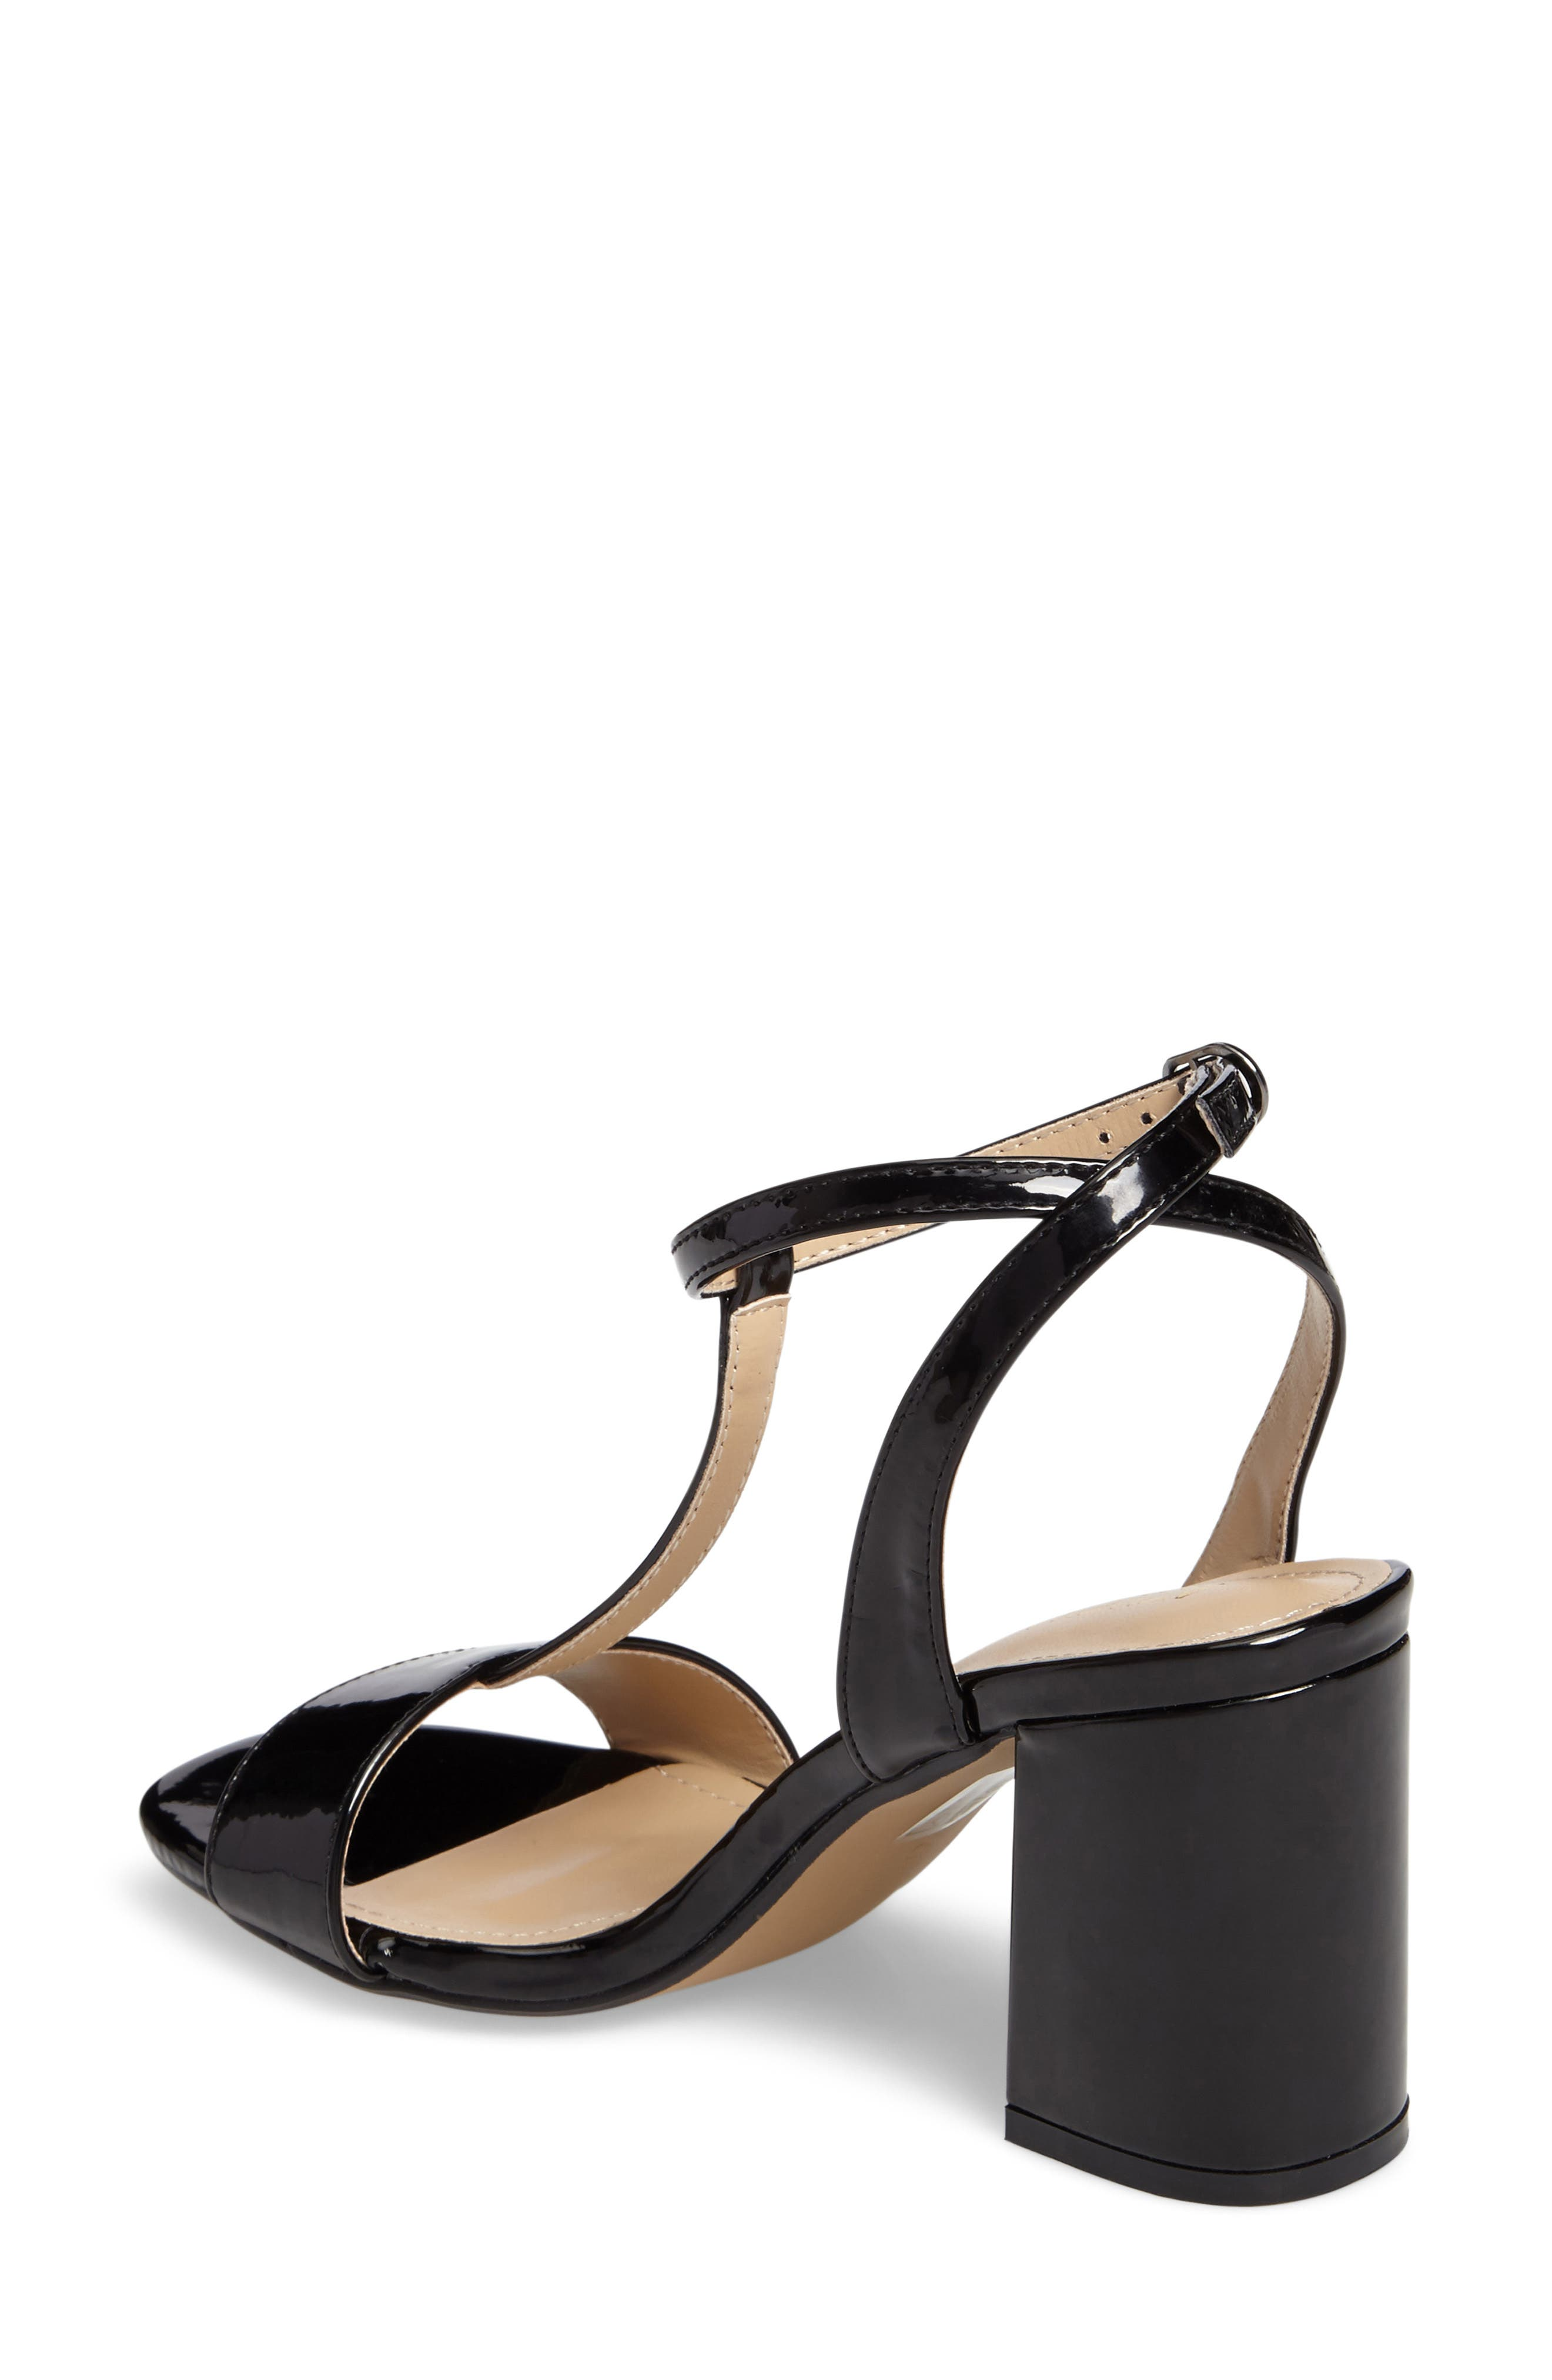 Ditaa T-Strap Sandal,                             Alternate thumbnail 2, color,                             Black Faux Patent